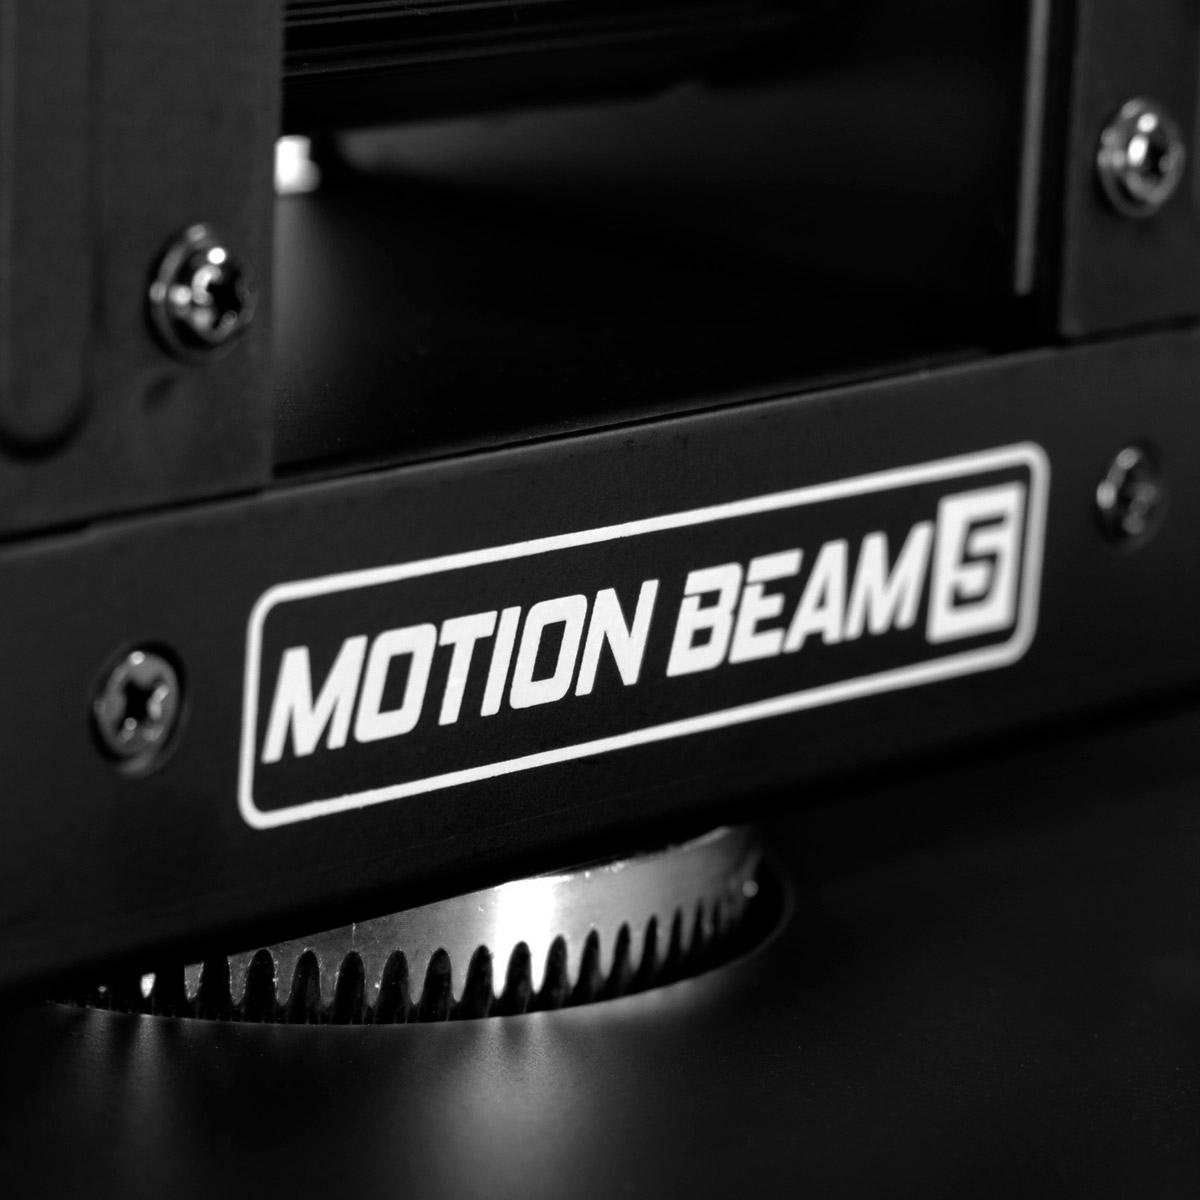 Motion Beam 5